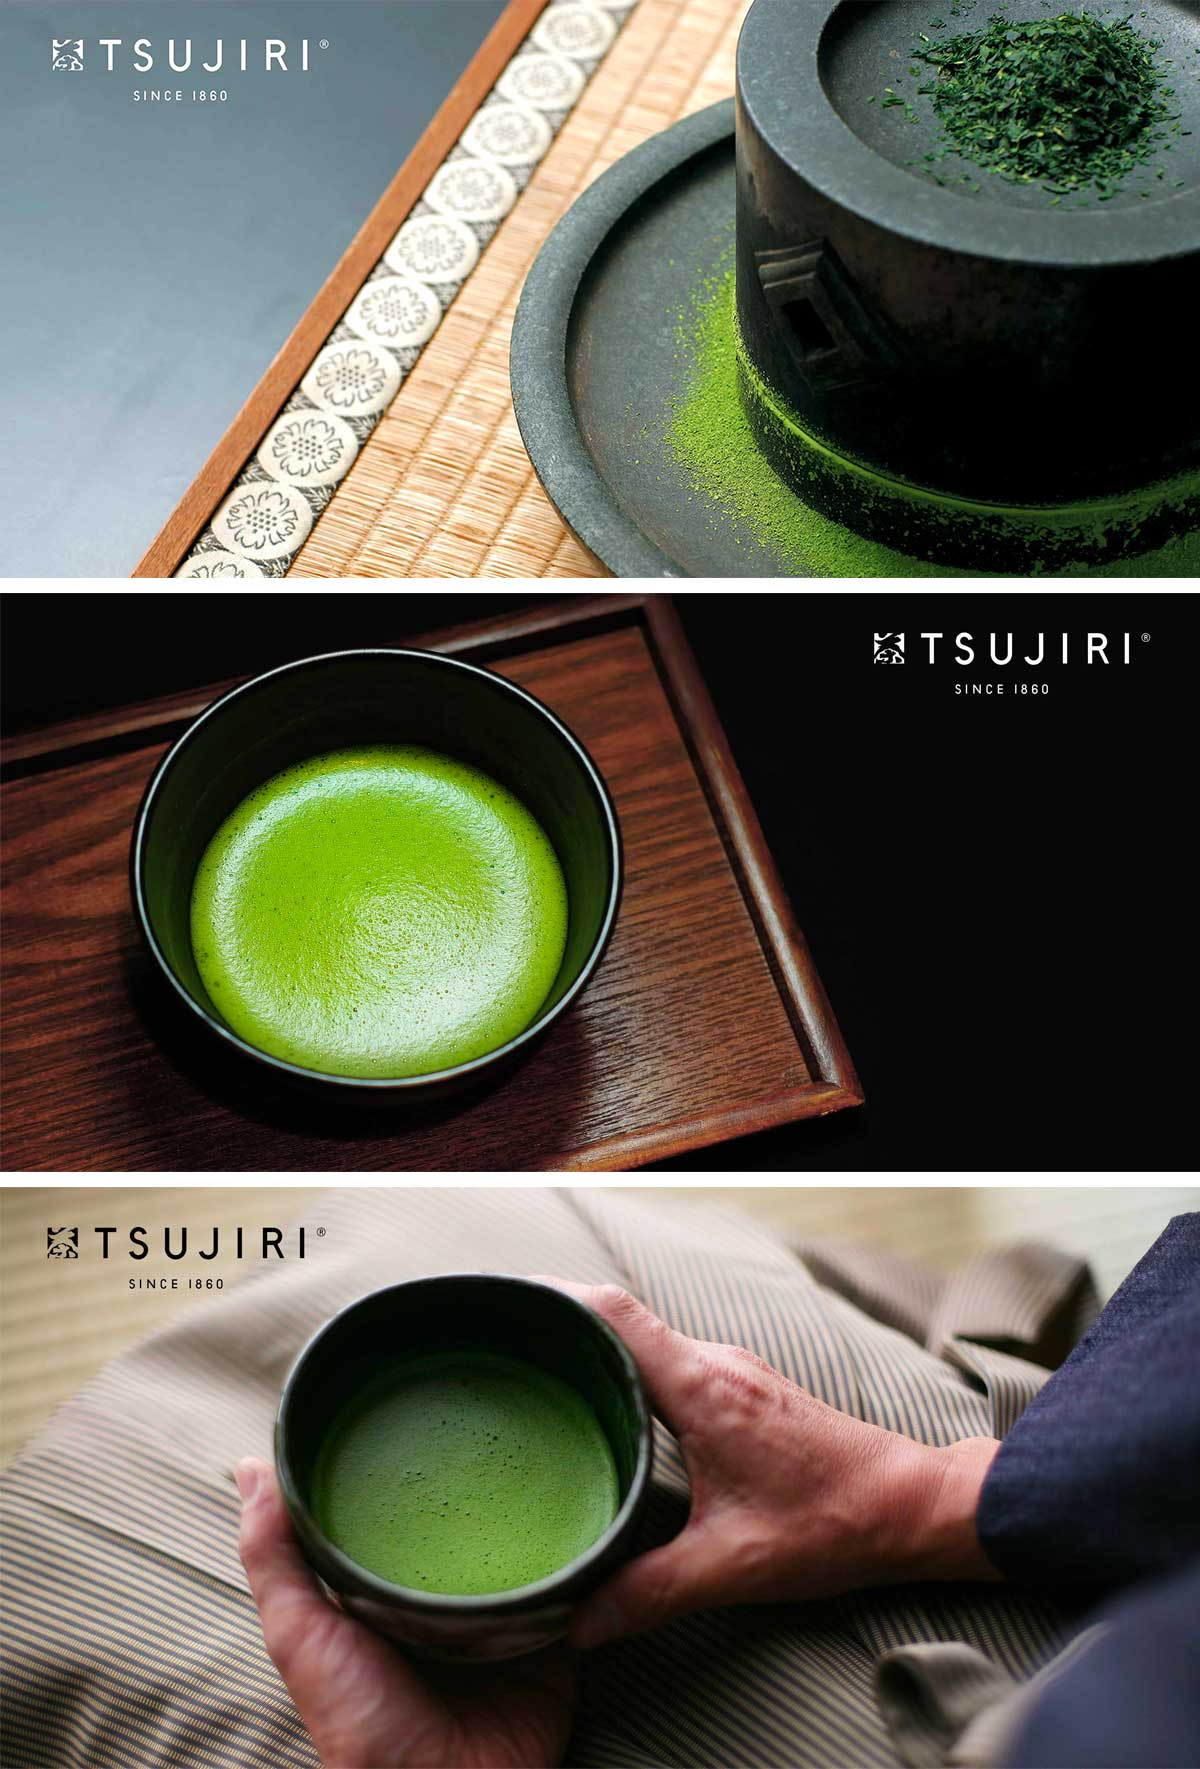 GIONTSUJIRI Uji Testumi Gyokuro Japanese Hand-Picked Green Tea